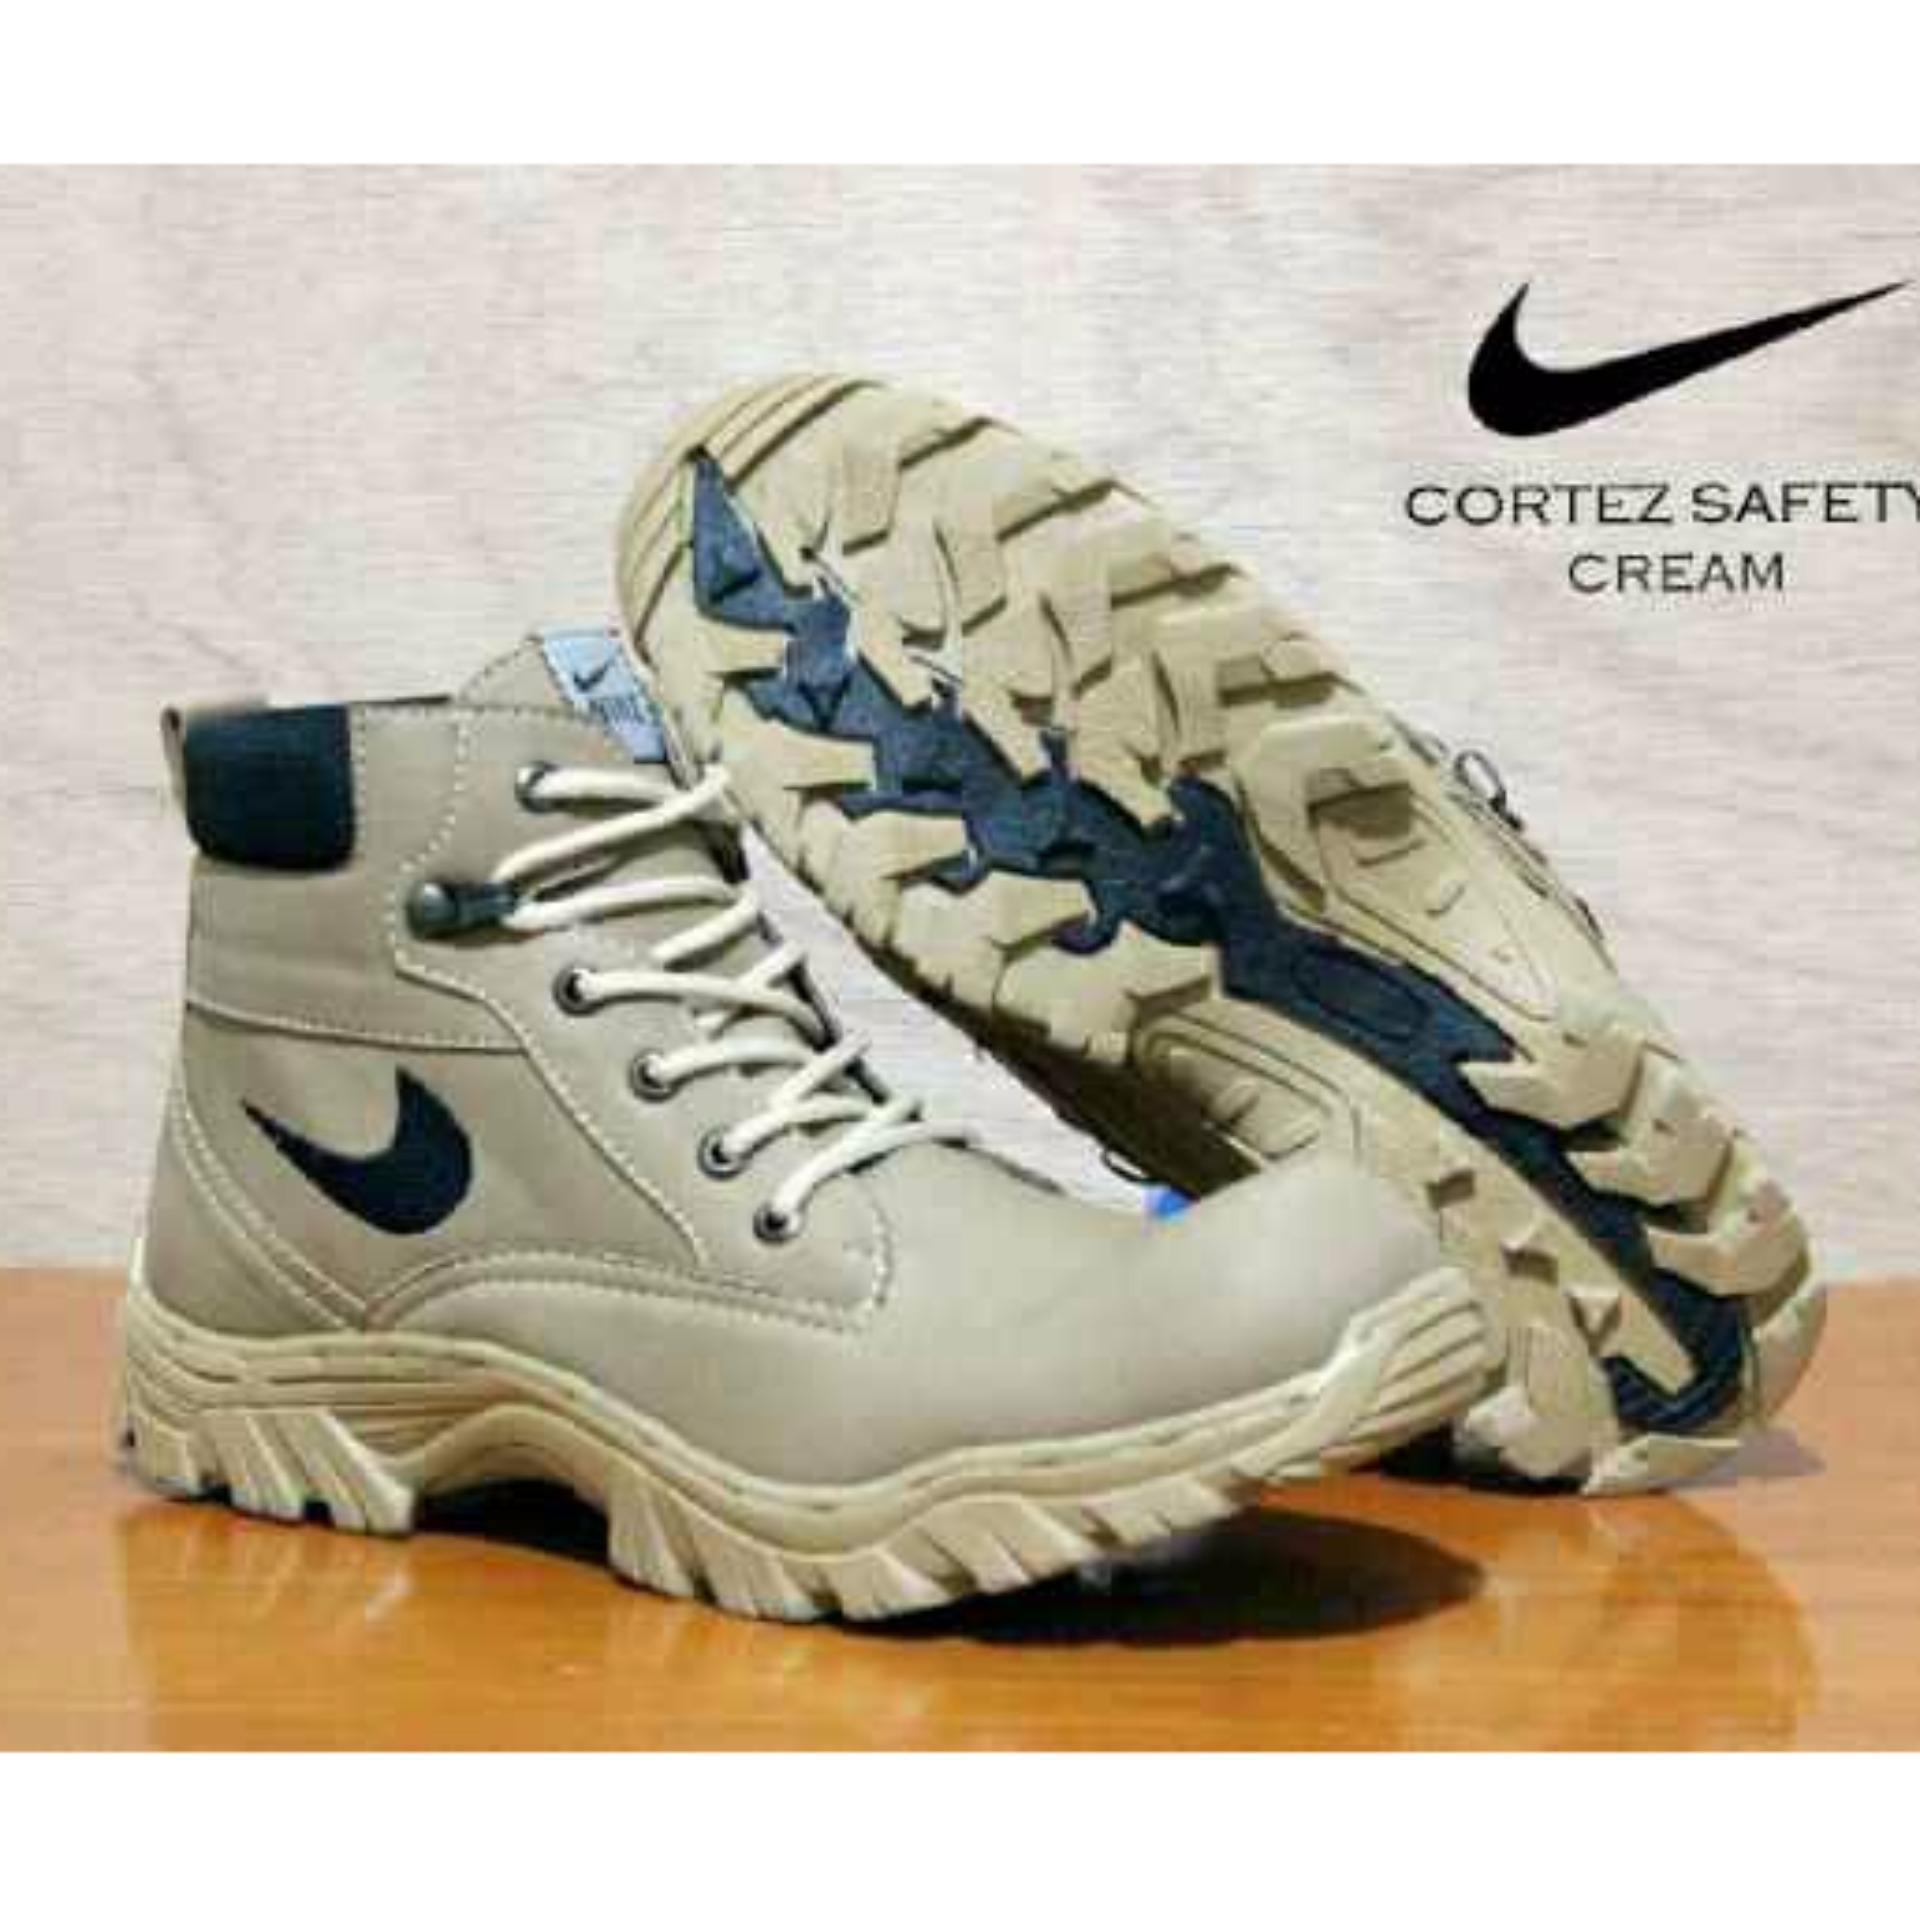 Jual Sepatu Safety Boots Pria Wanita Sepatu Gunung Elda Cortez Cream Satu Set